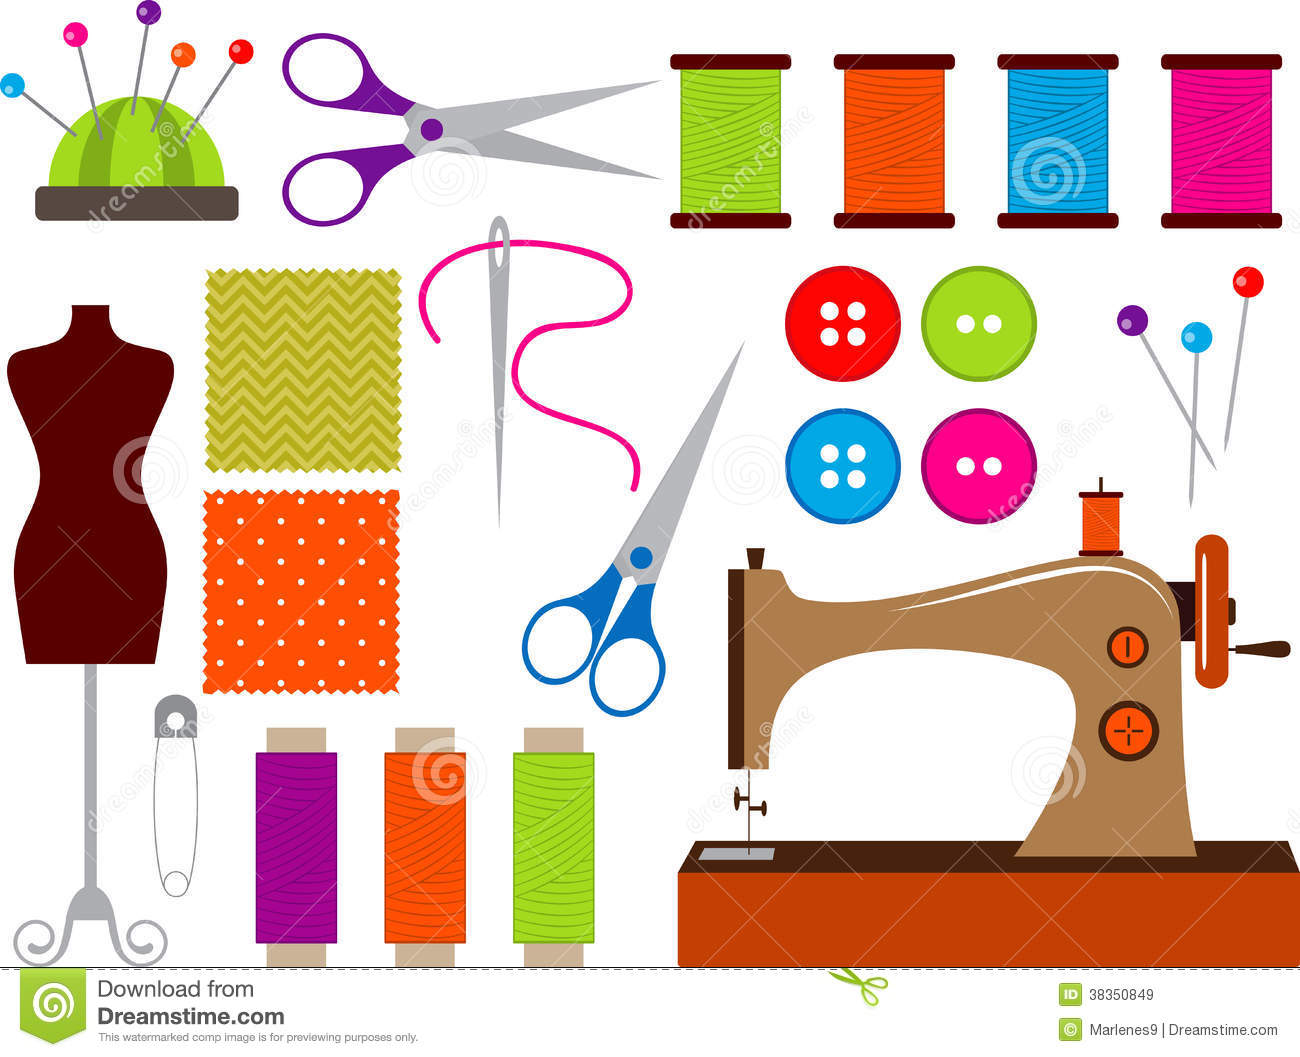 Dressmaking clipart - Clipground